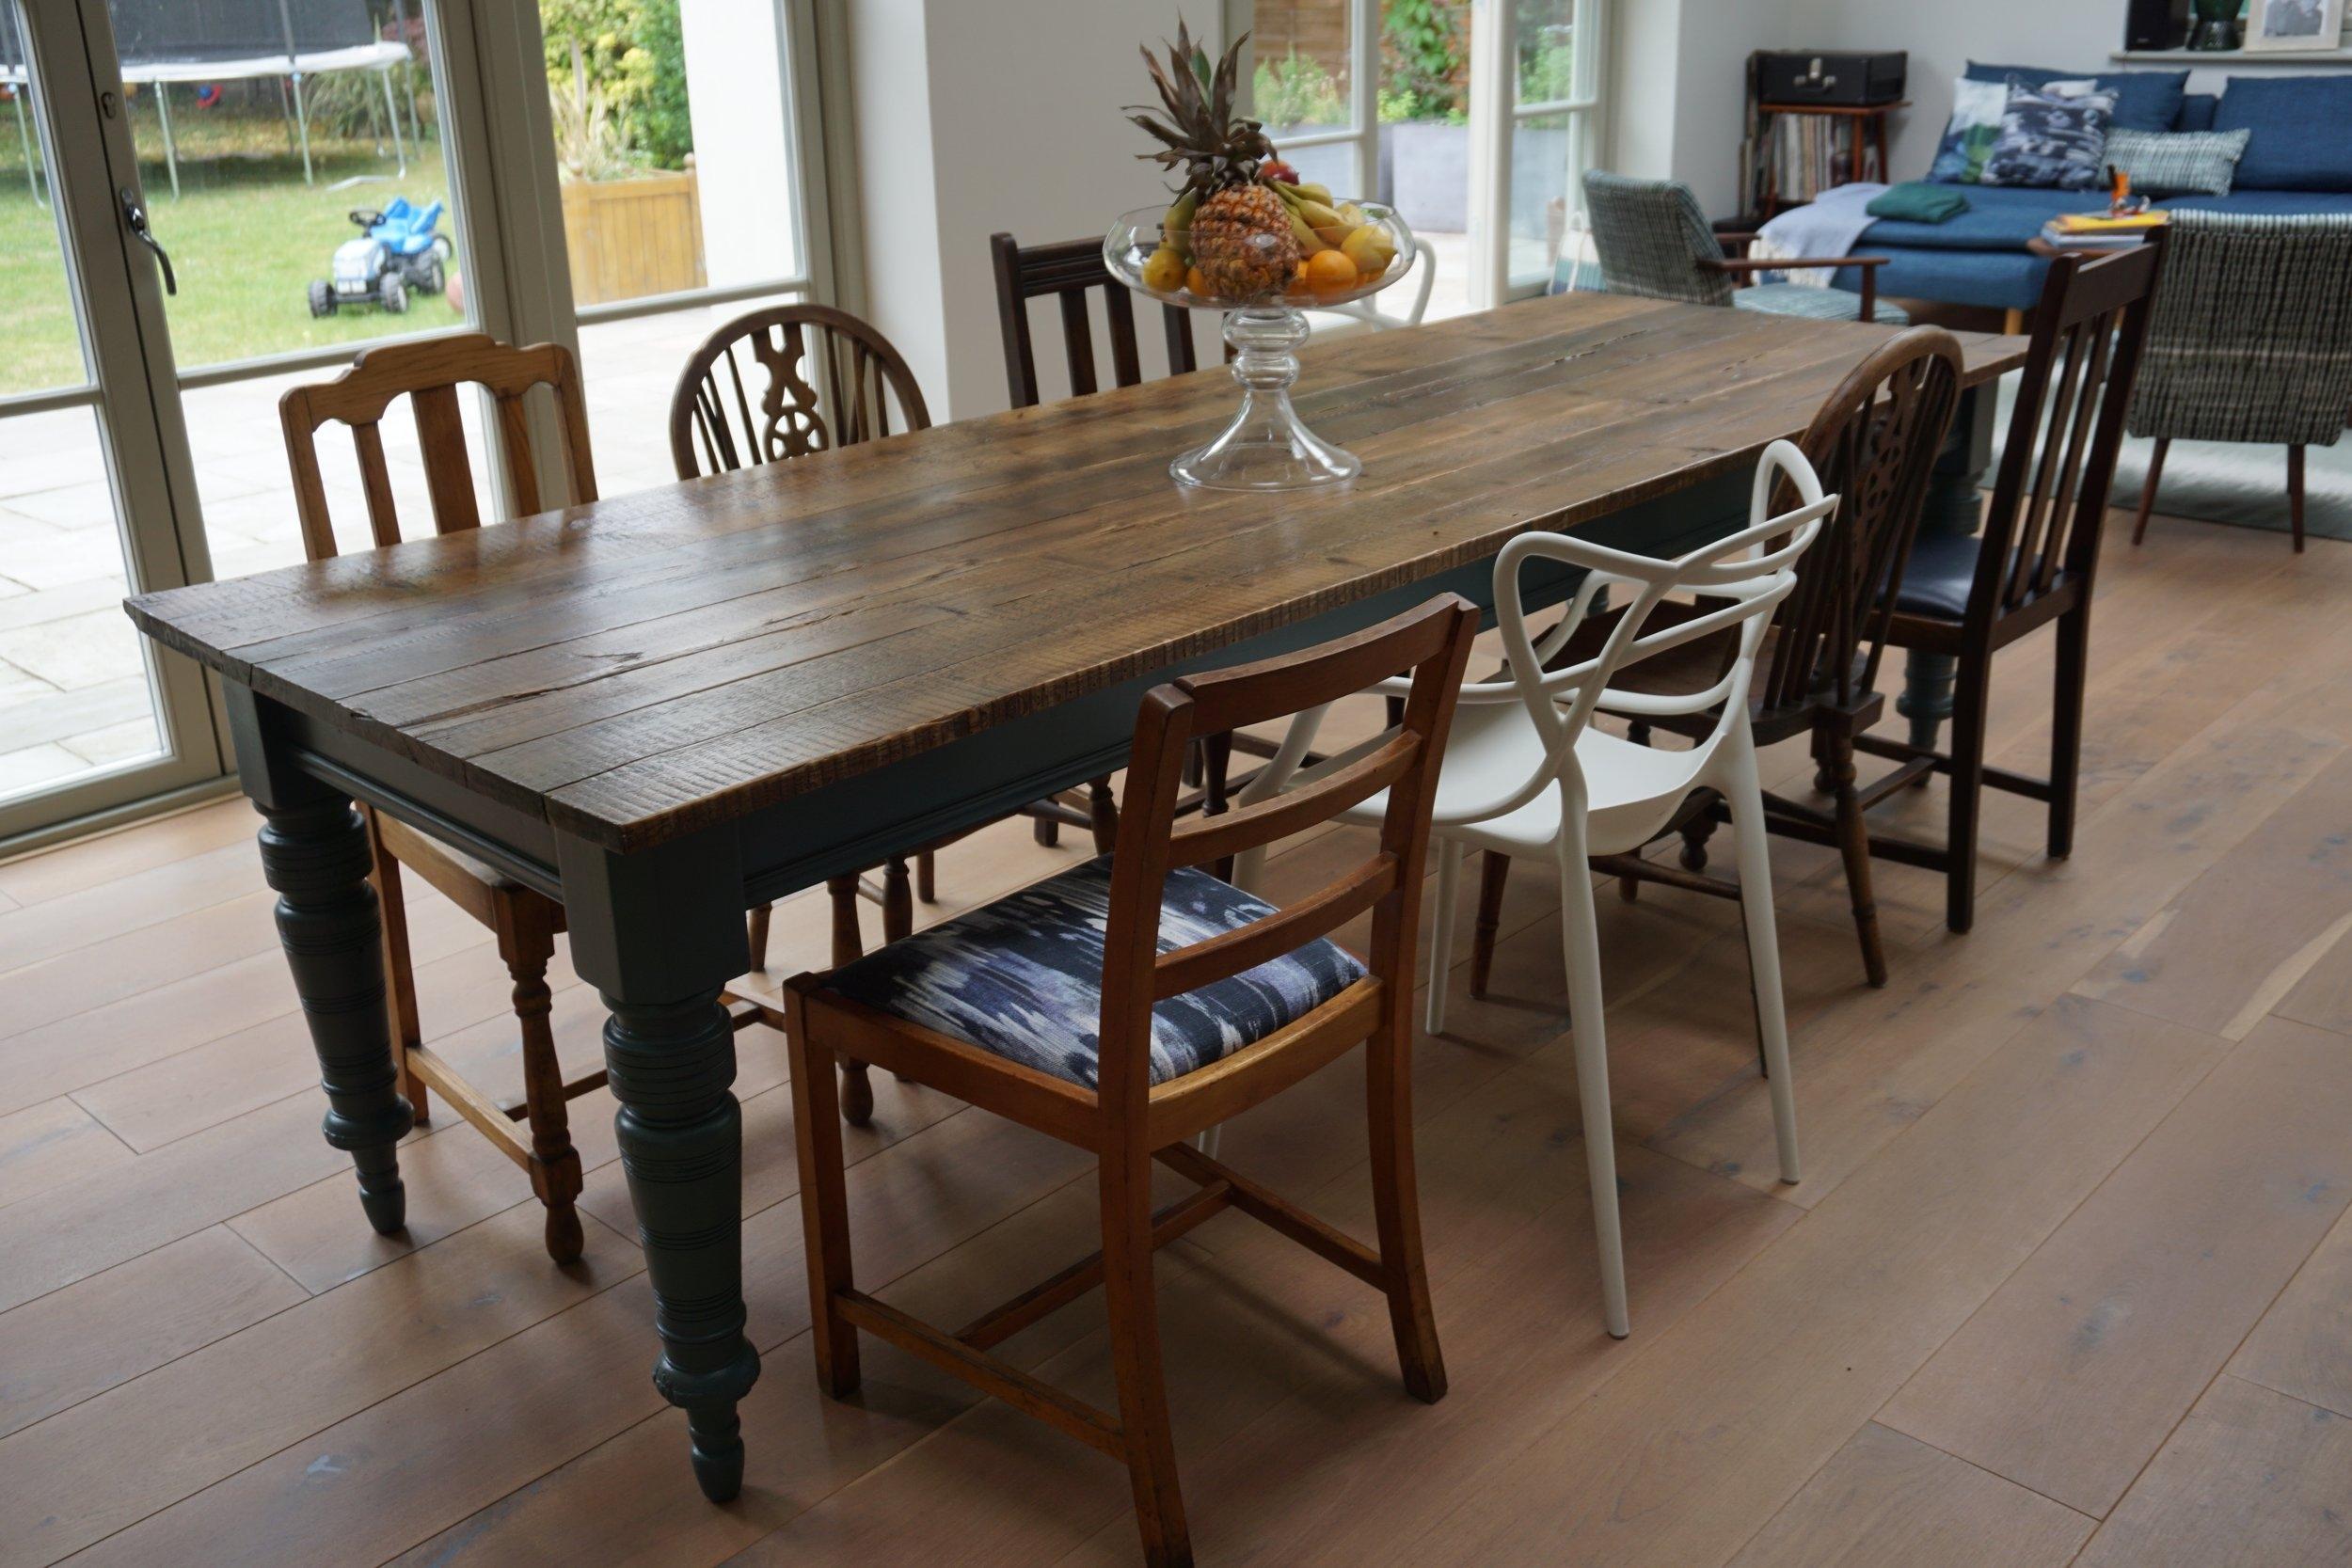 Bespoke Reclaimed Dining Table